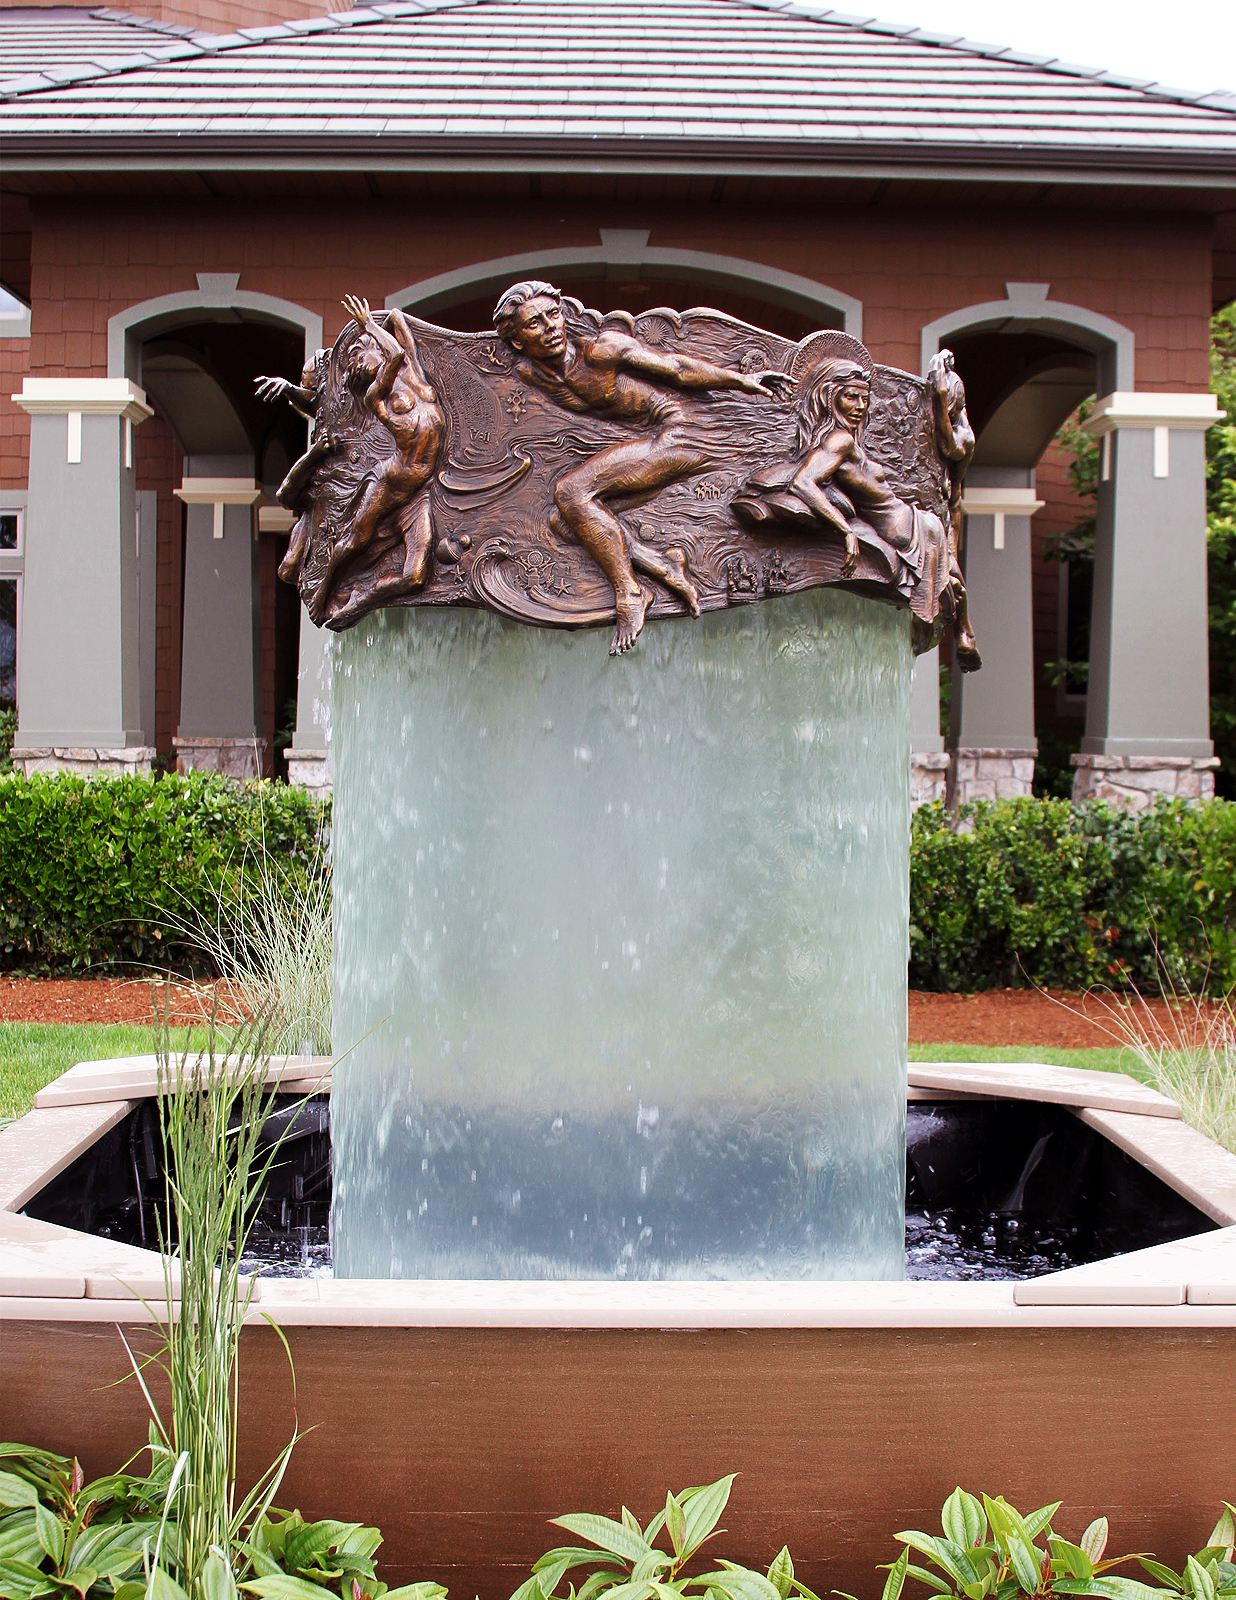 Symphony in S Minor – Rotating Fountain